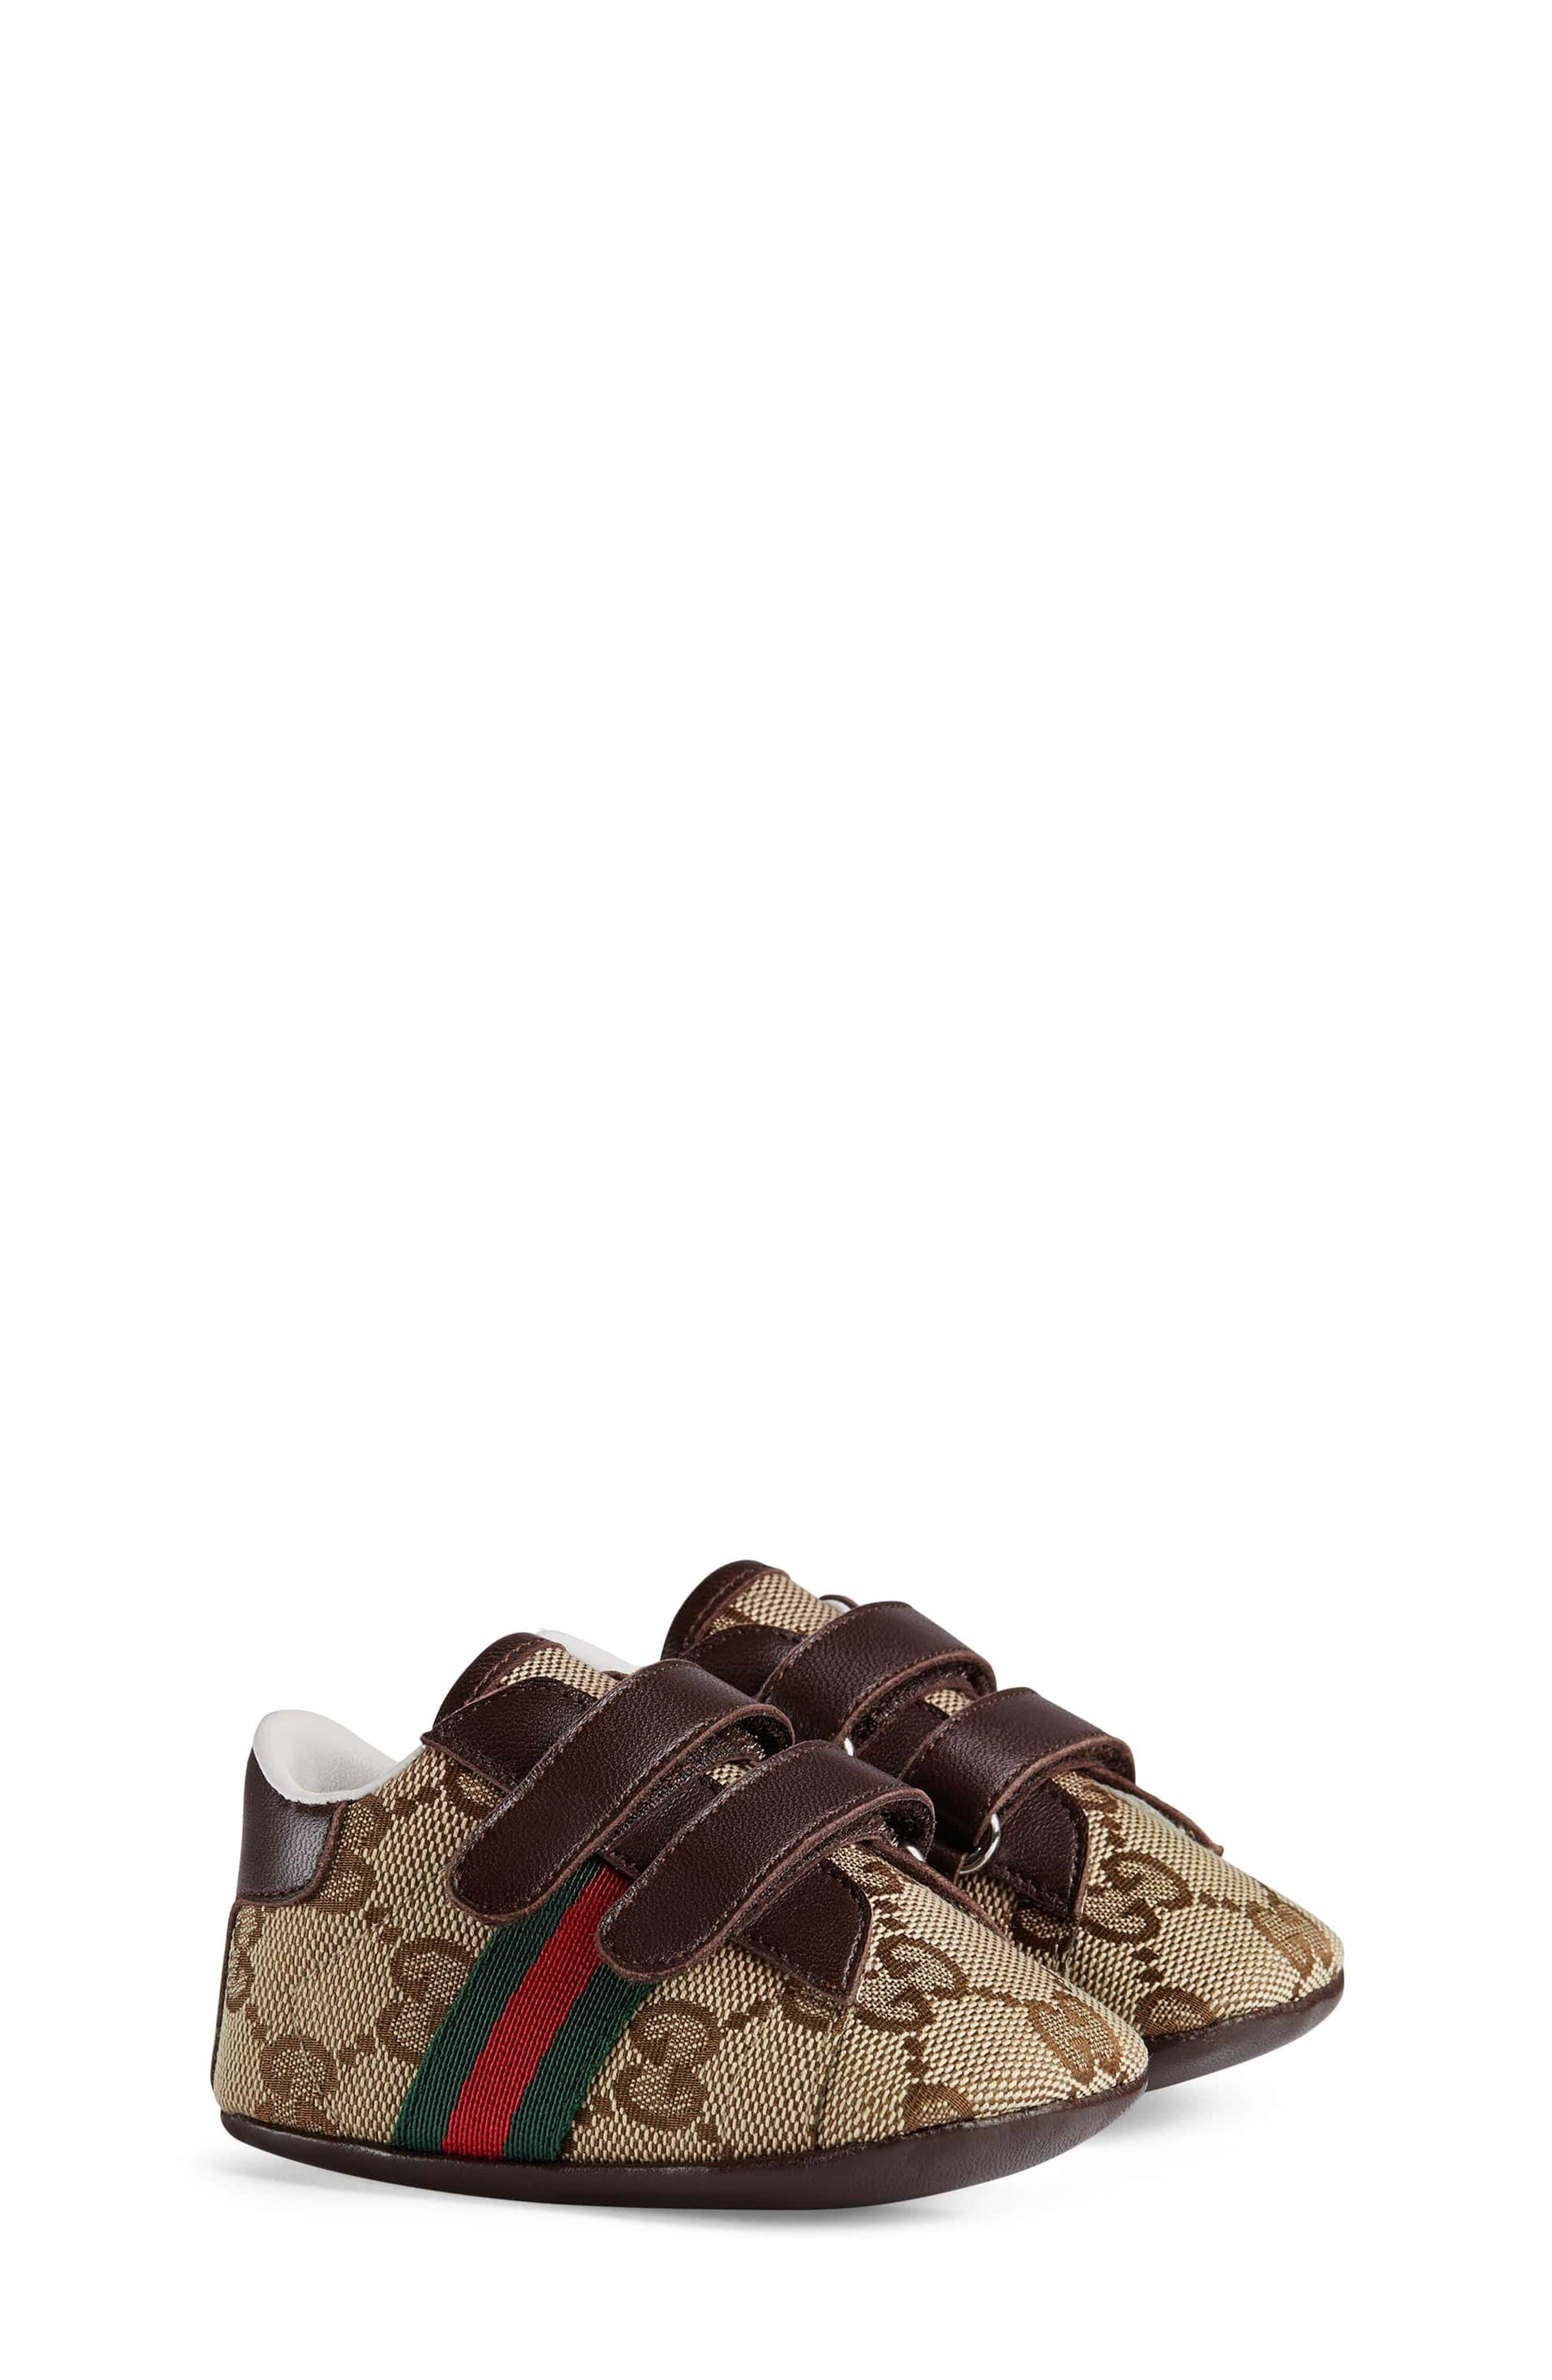 Gucci Ace Crib Shoe (Baby)